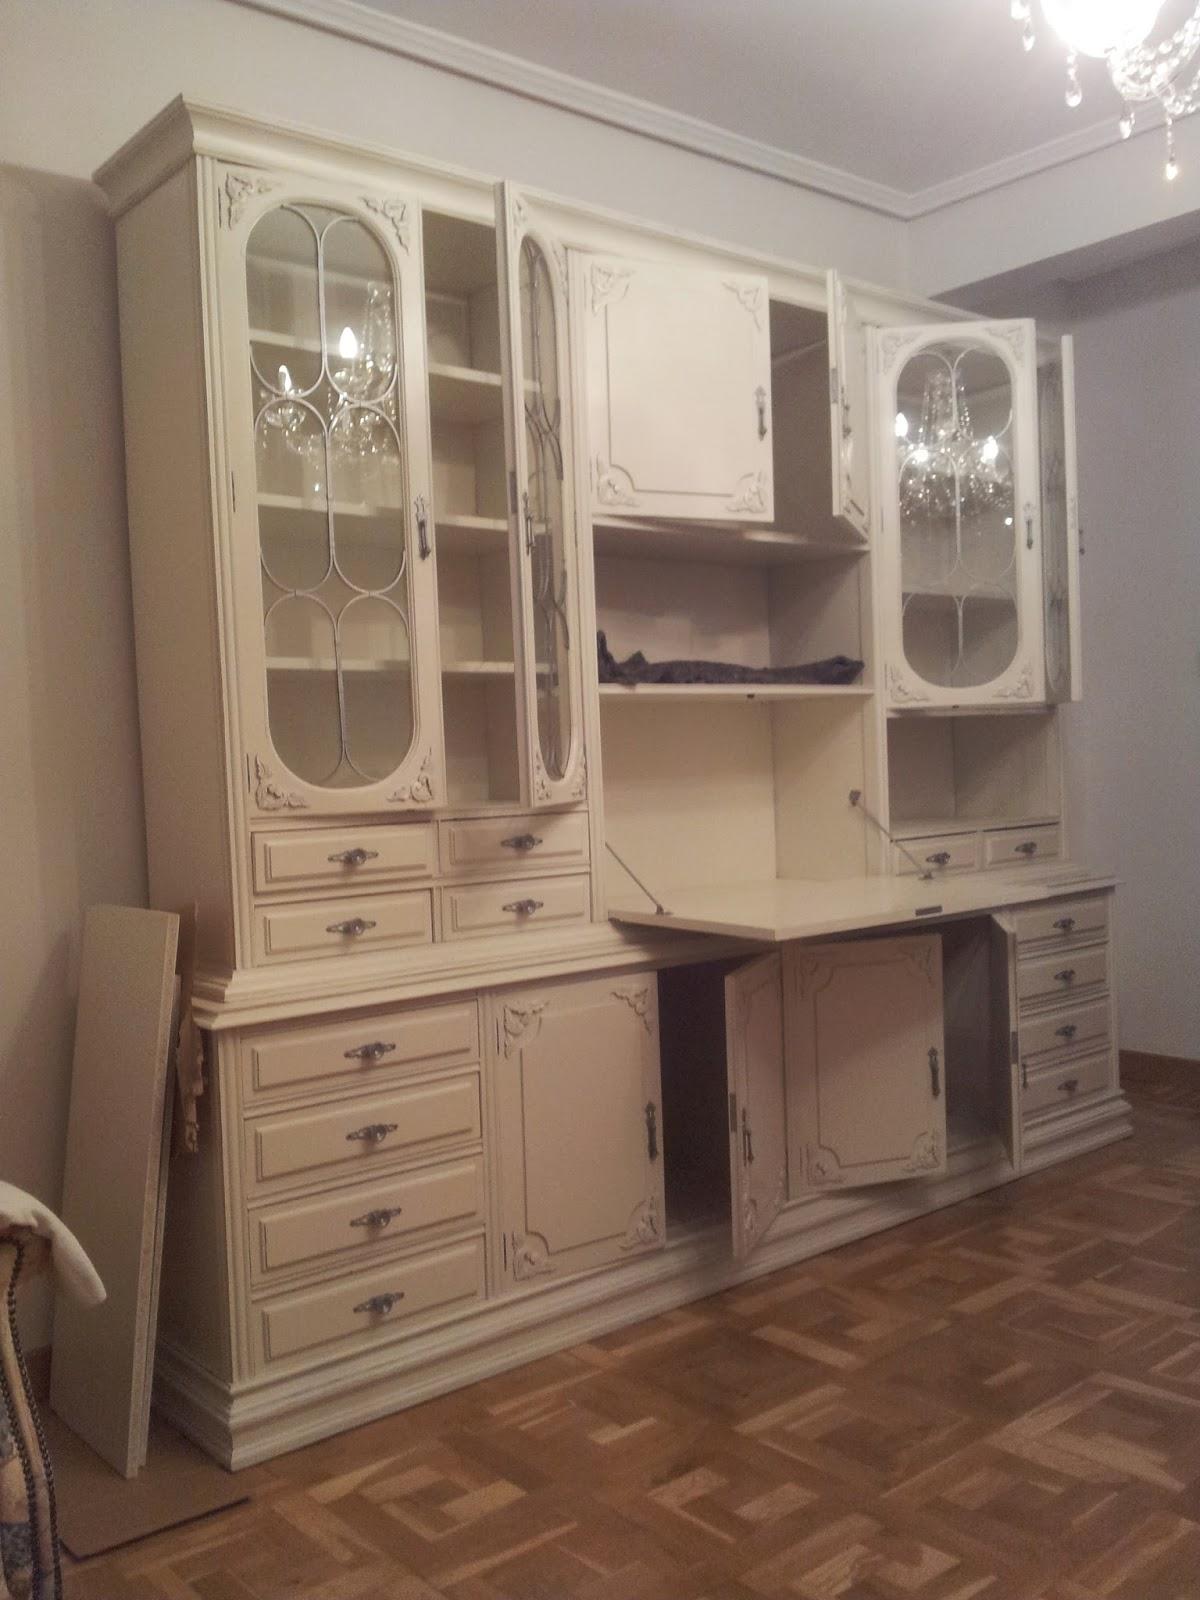 Muebles antiguos restaurados en blanco fabulous decoupage - Muebles pintados en blanco ...